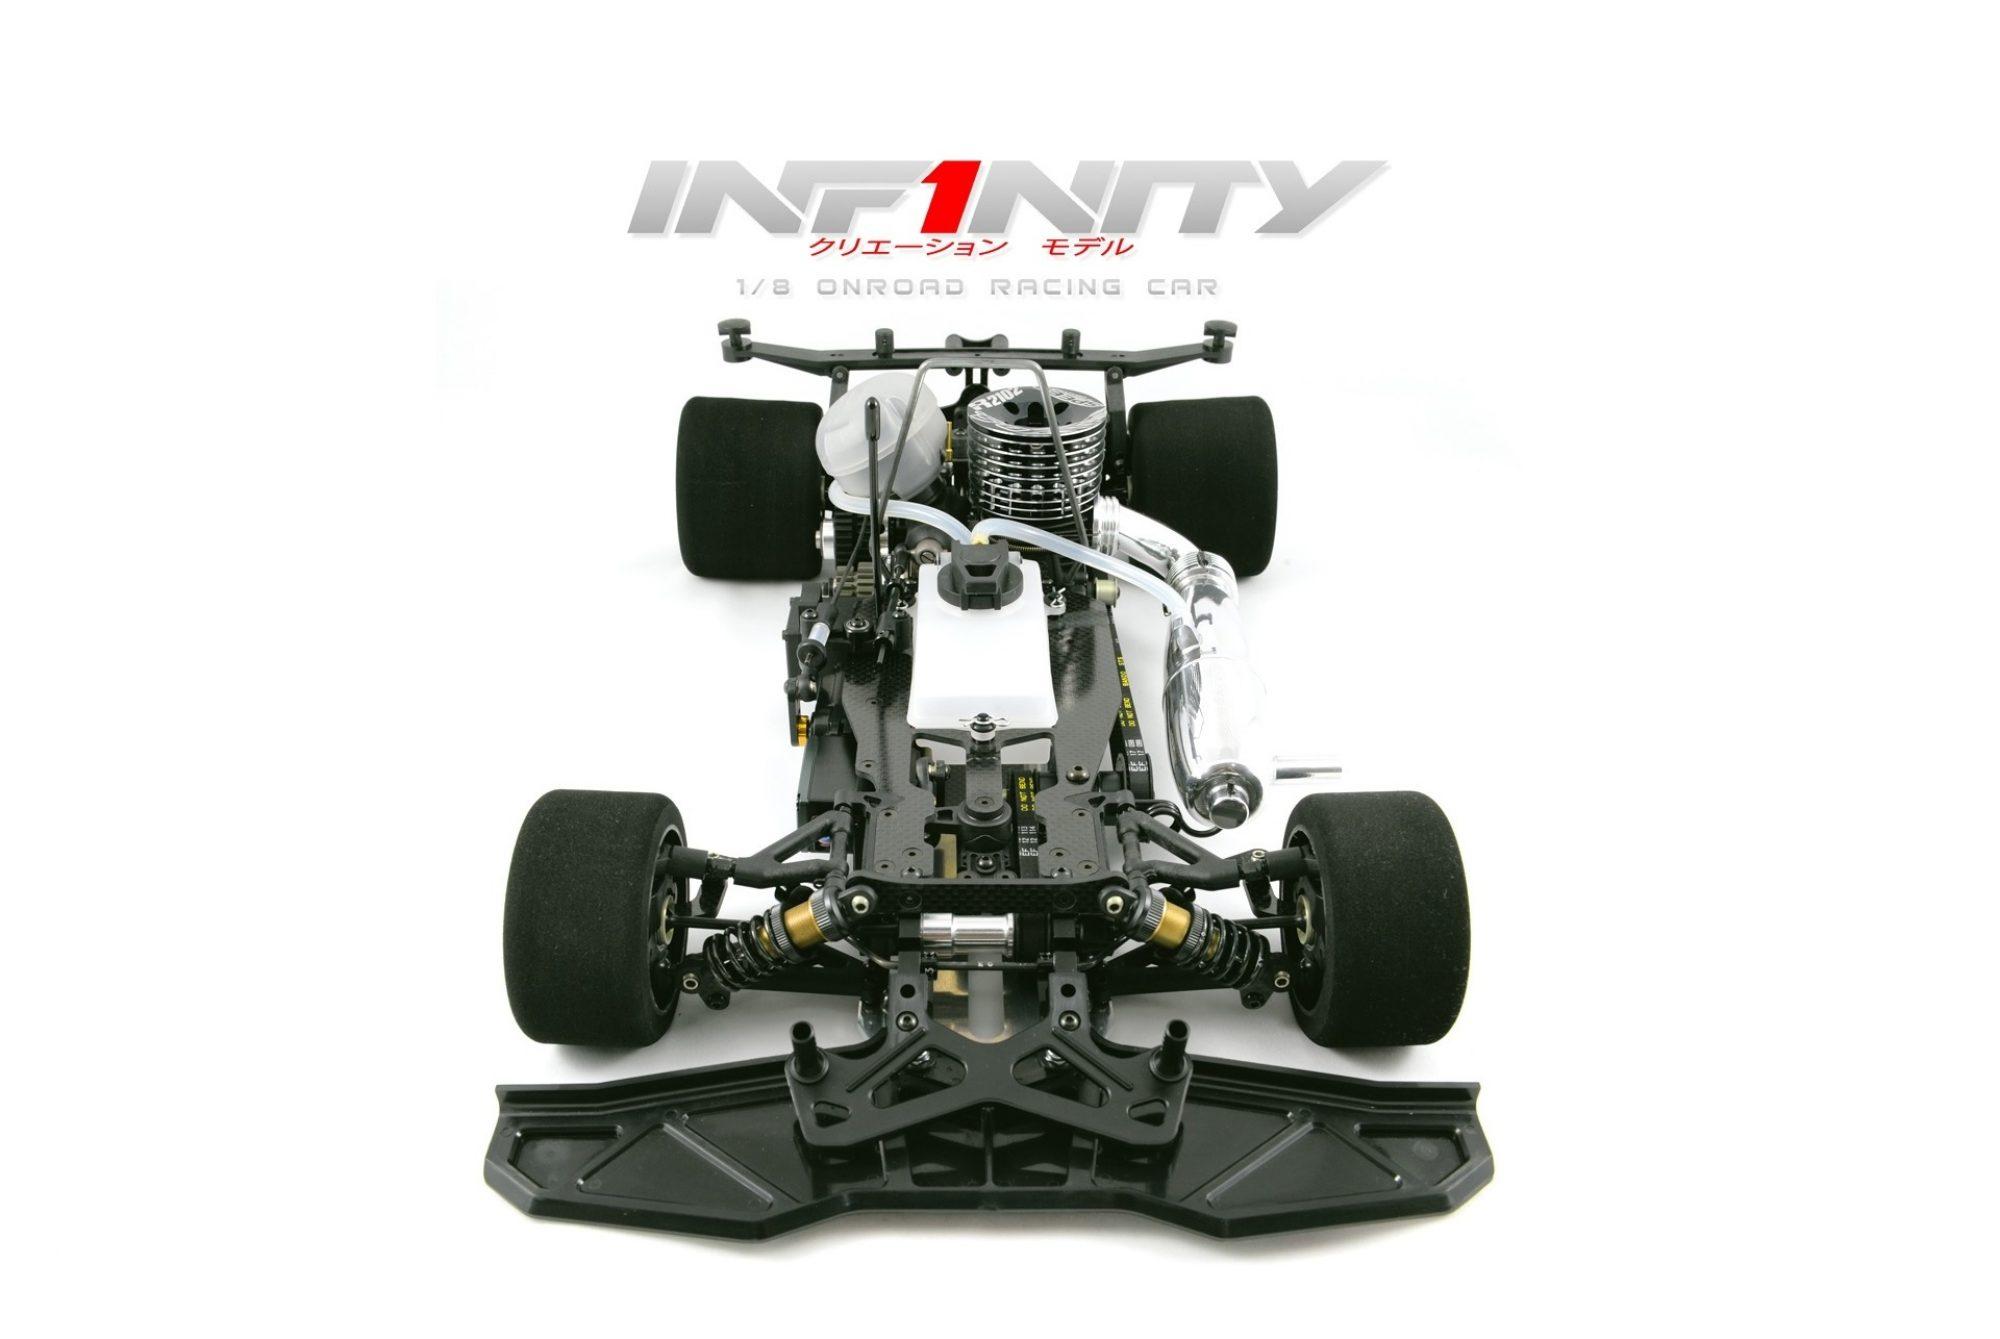 Infinity-shop.dk